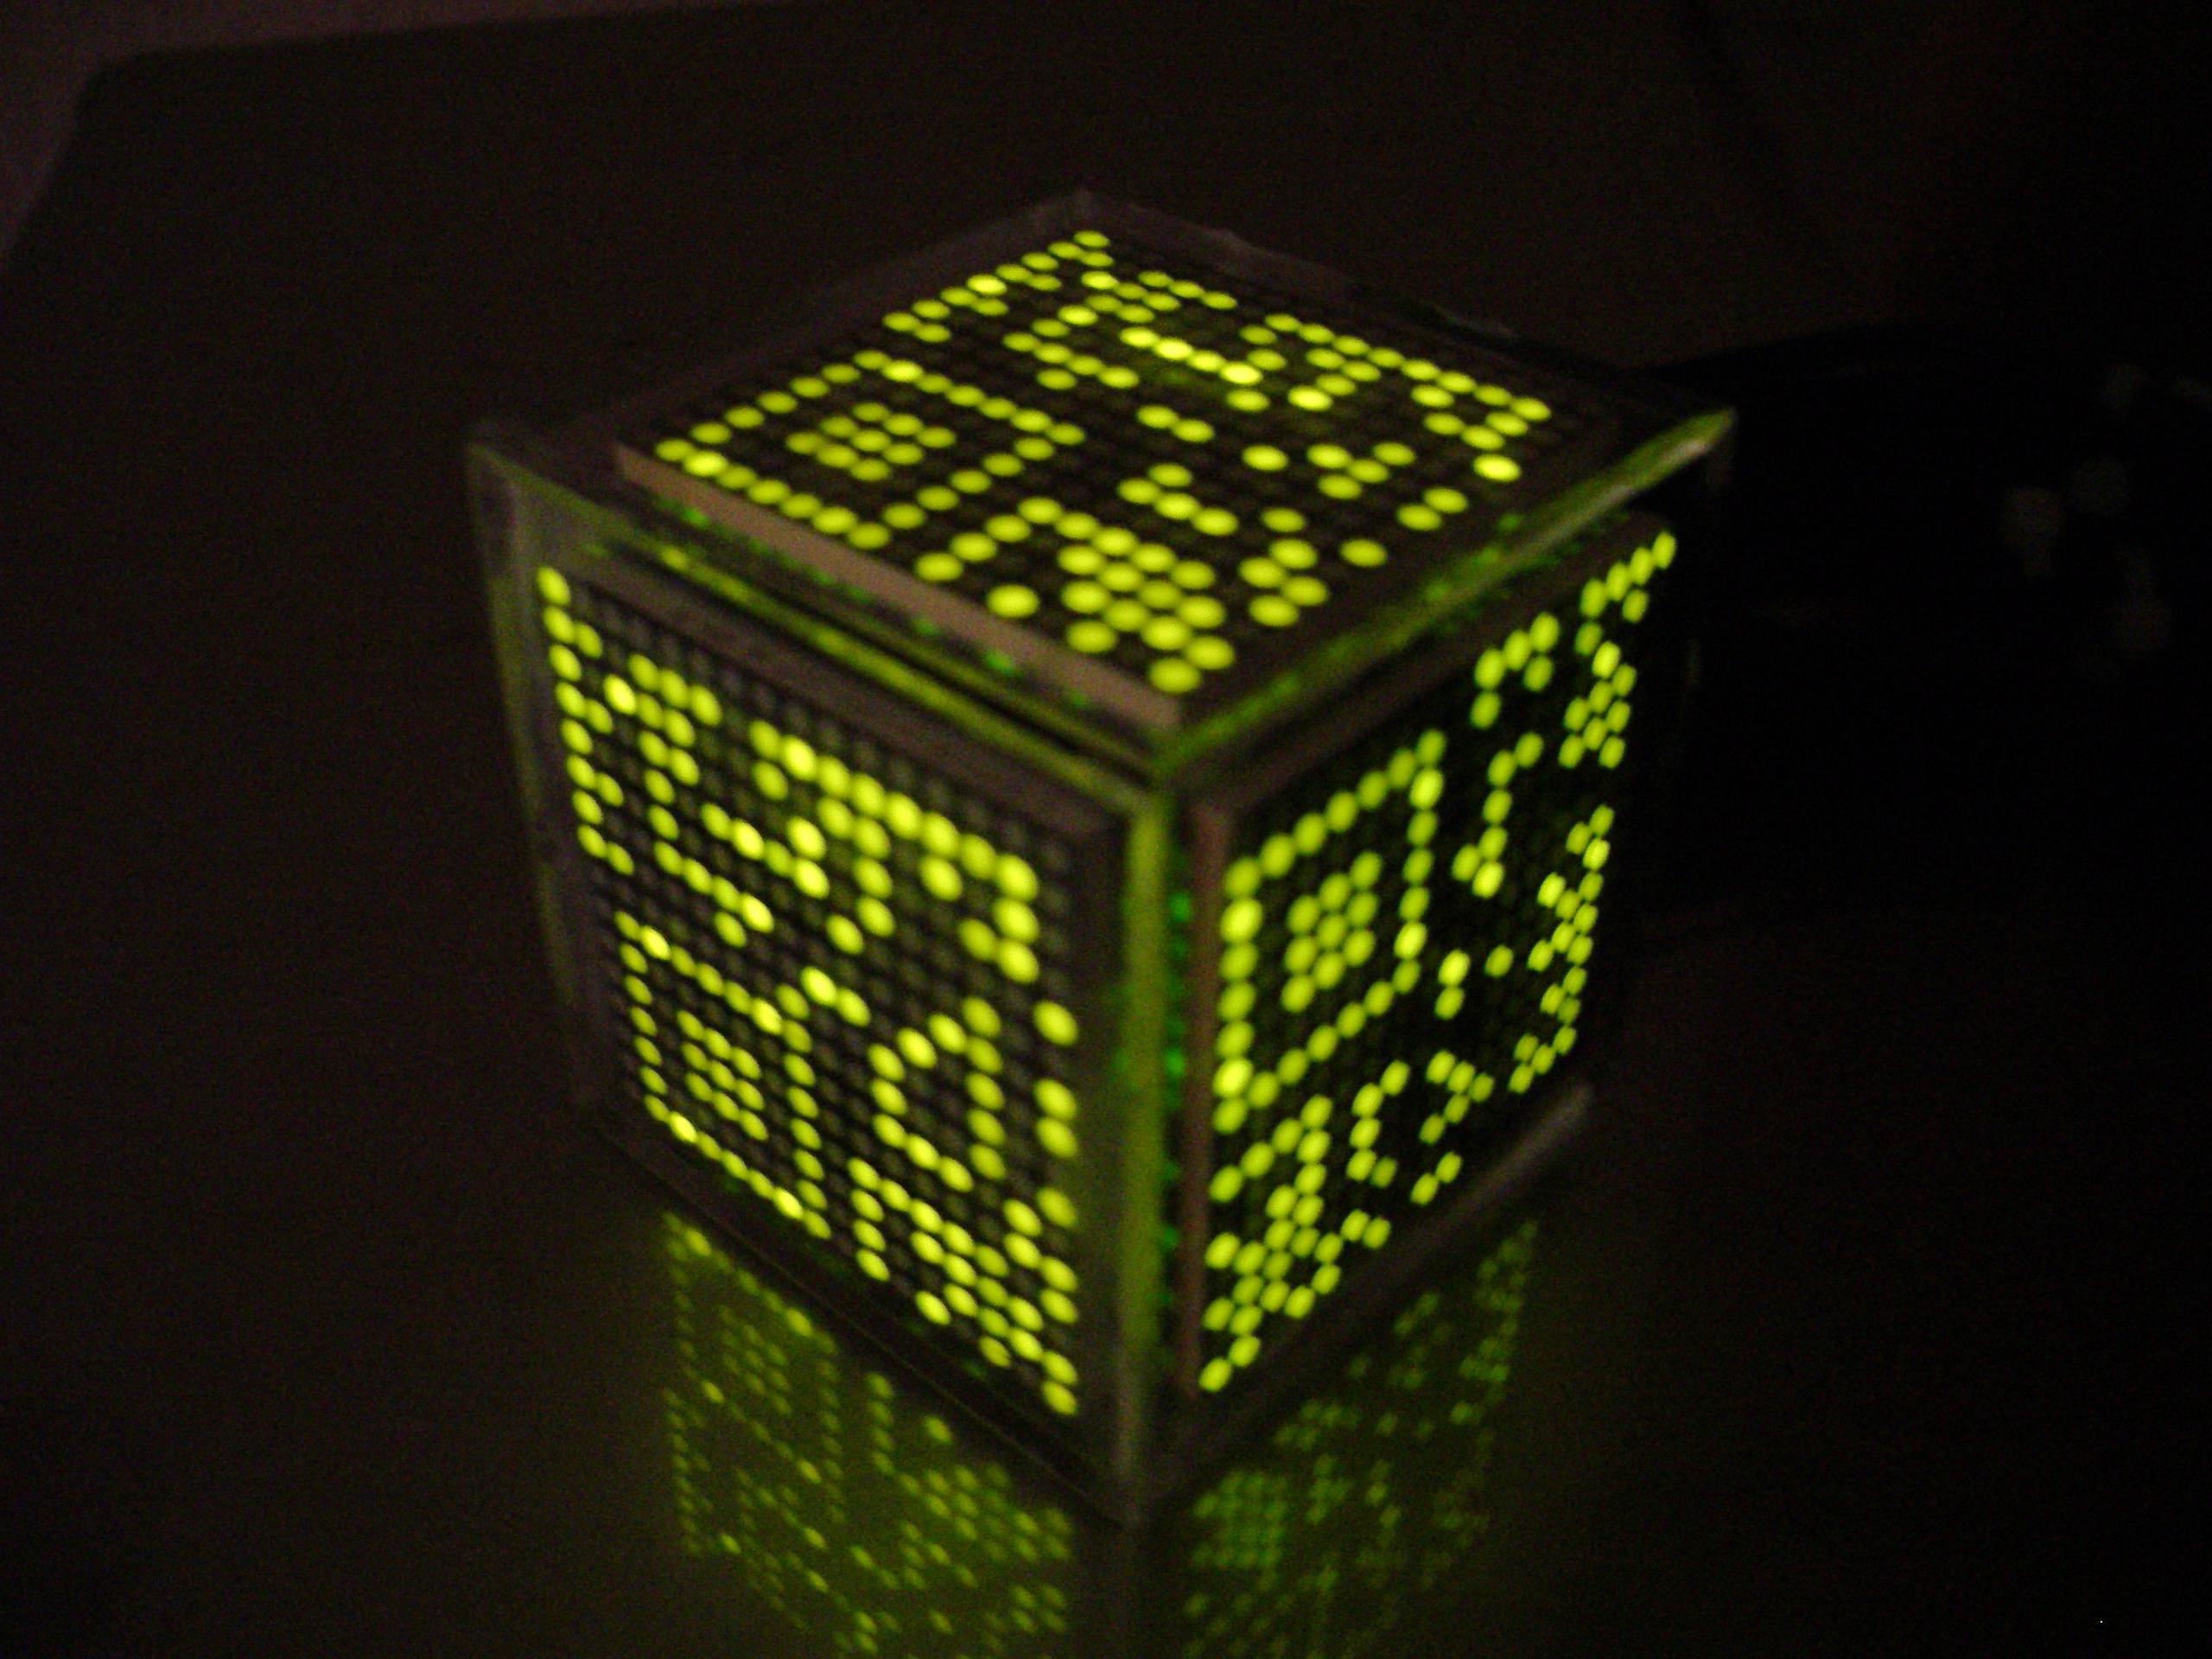 Cube 3d Wallpapers Cool Wallpaper 2560x1920